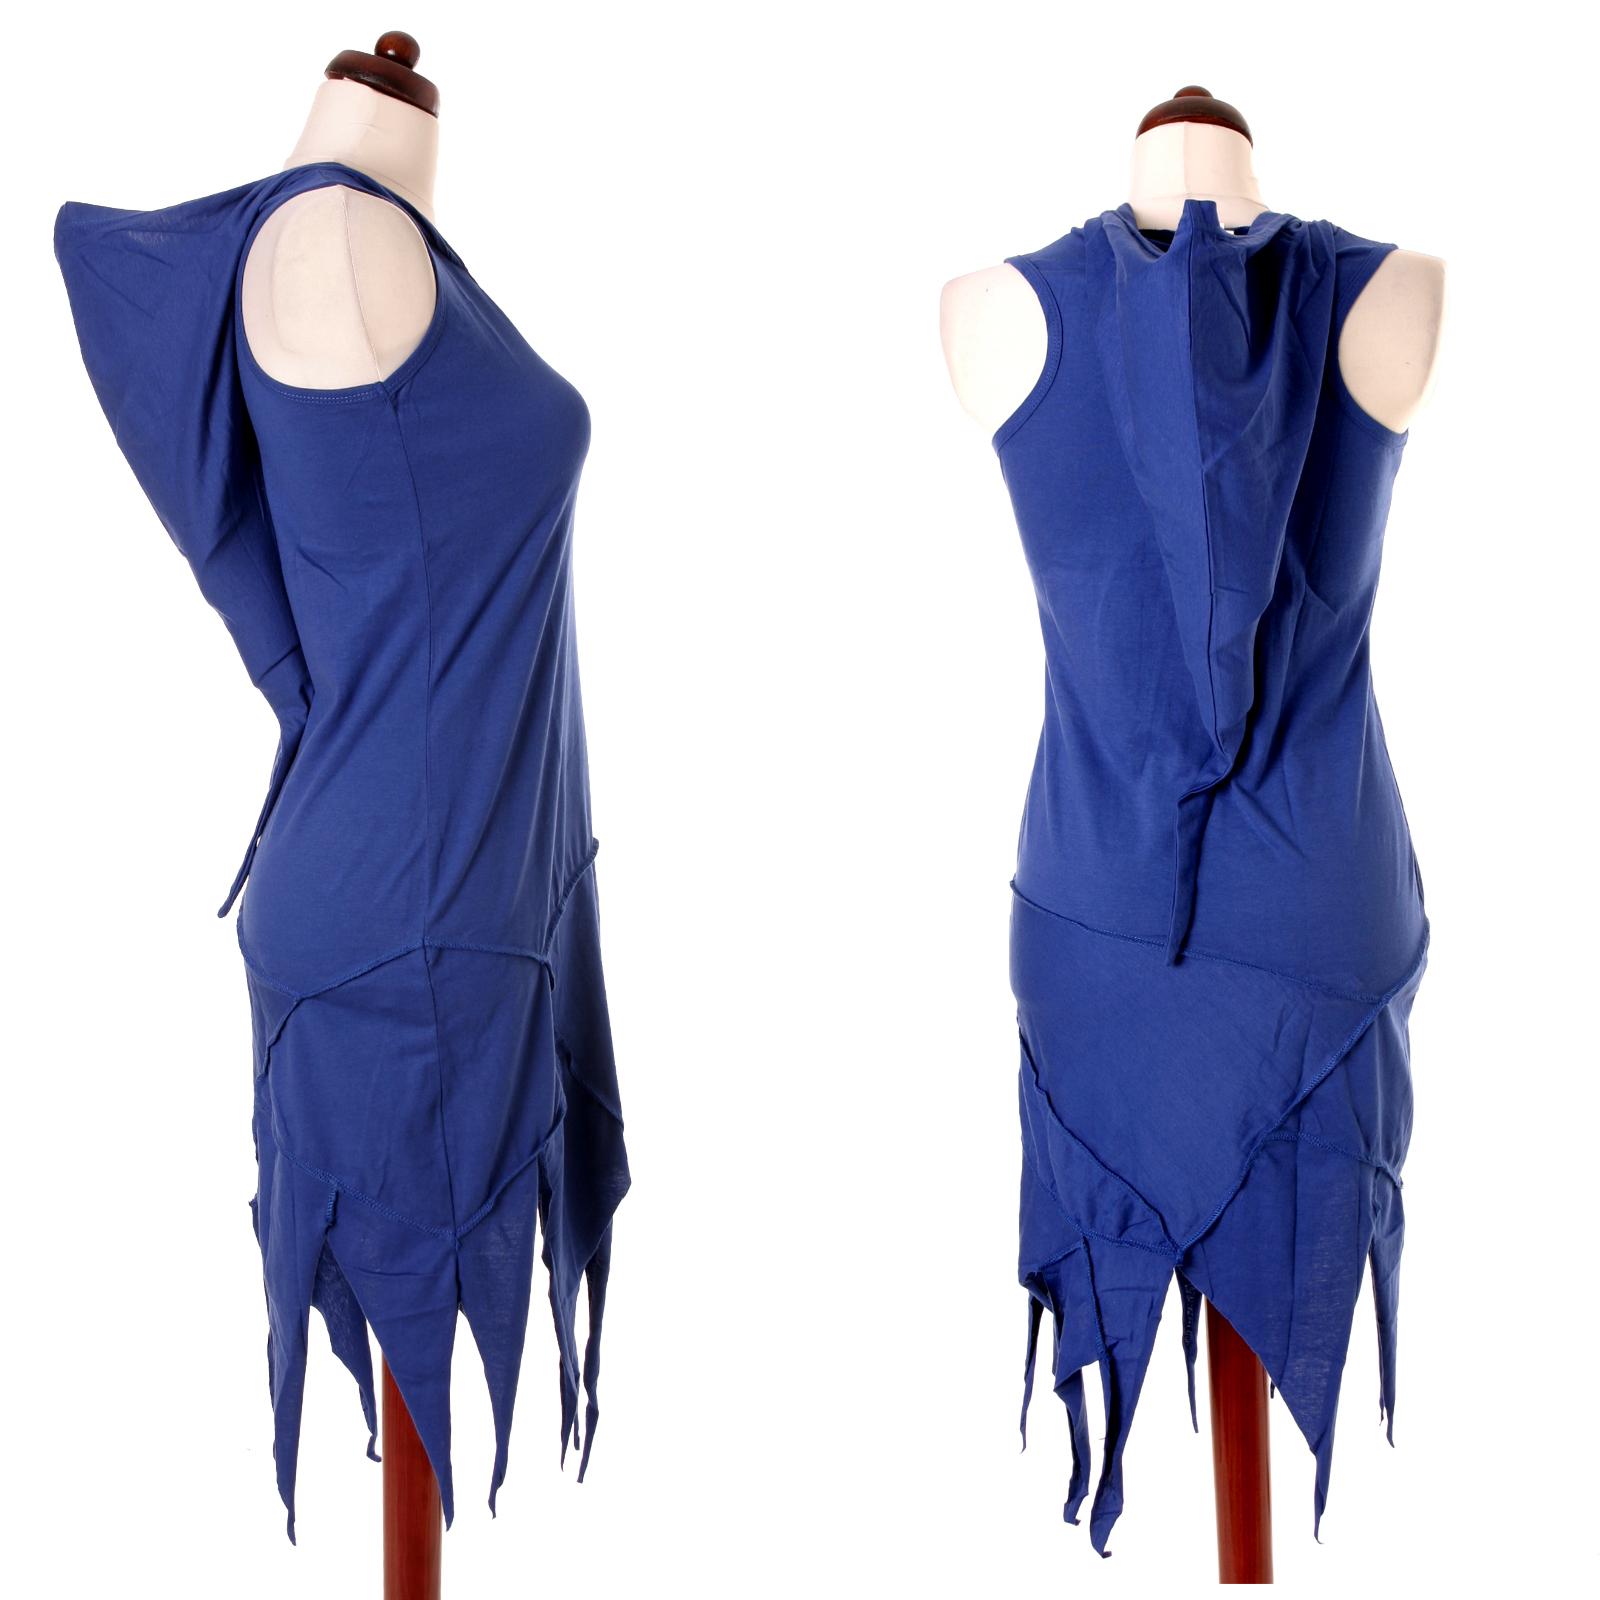 Vishes Goa Kleid Zipfelkapuze Hoodie Dress Kapuzenkleid Strandkleid Hippie Larp | eBay